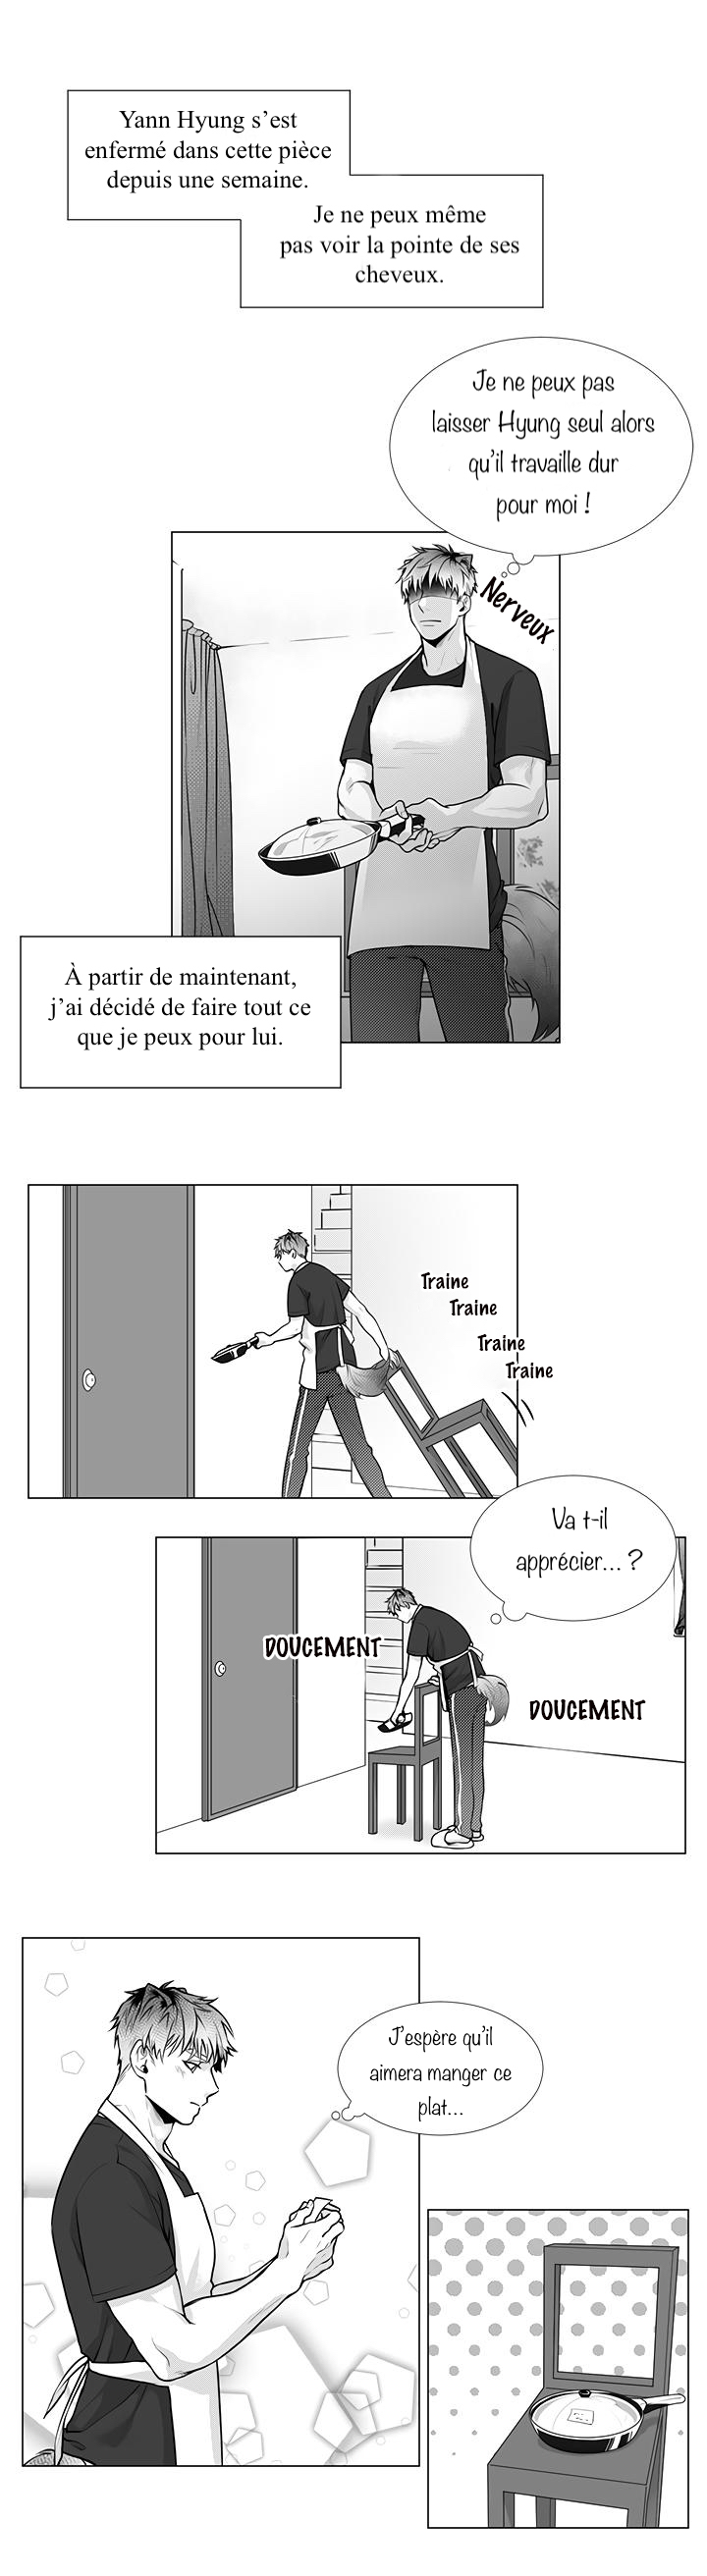 https://nine.mangadogs.com/fr_manga/pic2/59/11515/518618/c5d2c718008d3490546d029cab134fb7.jpg Page 13